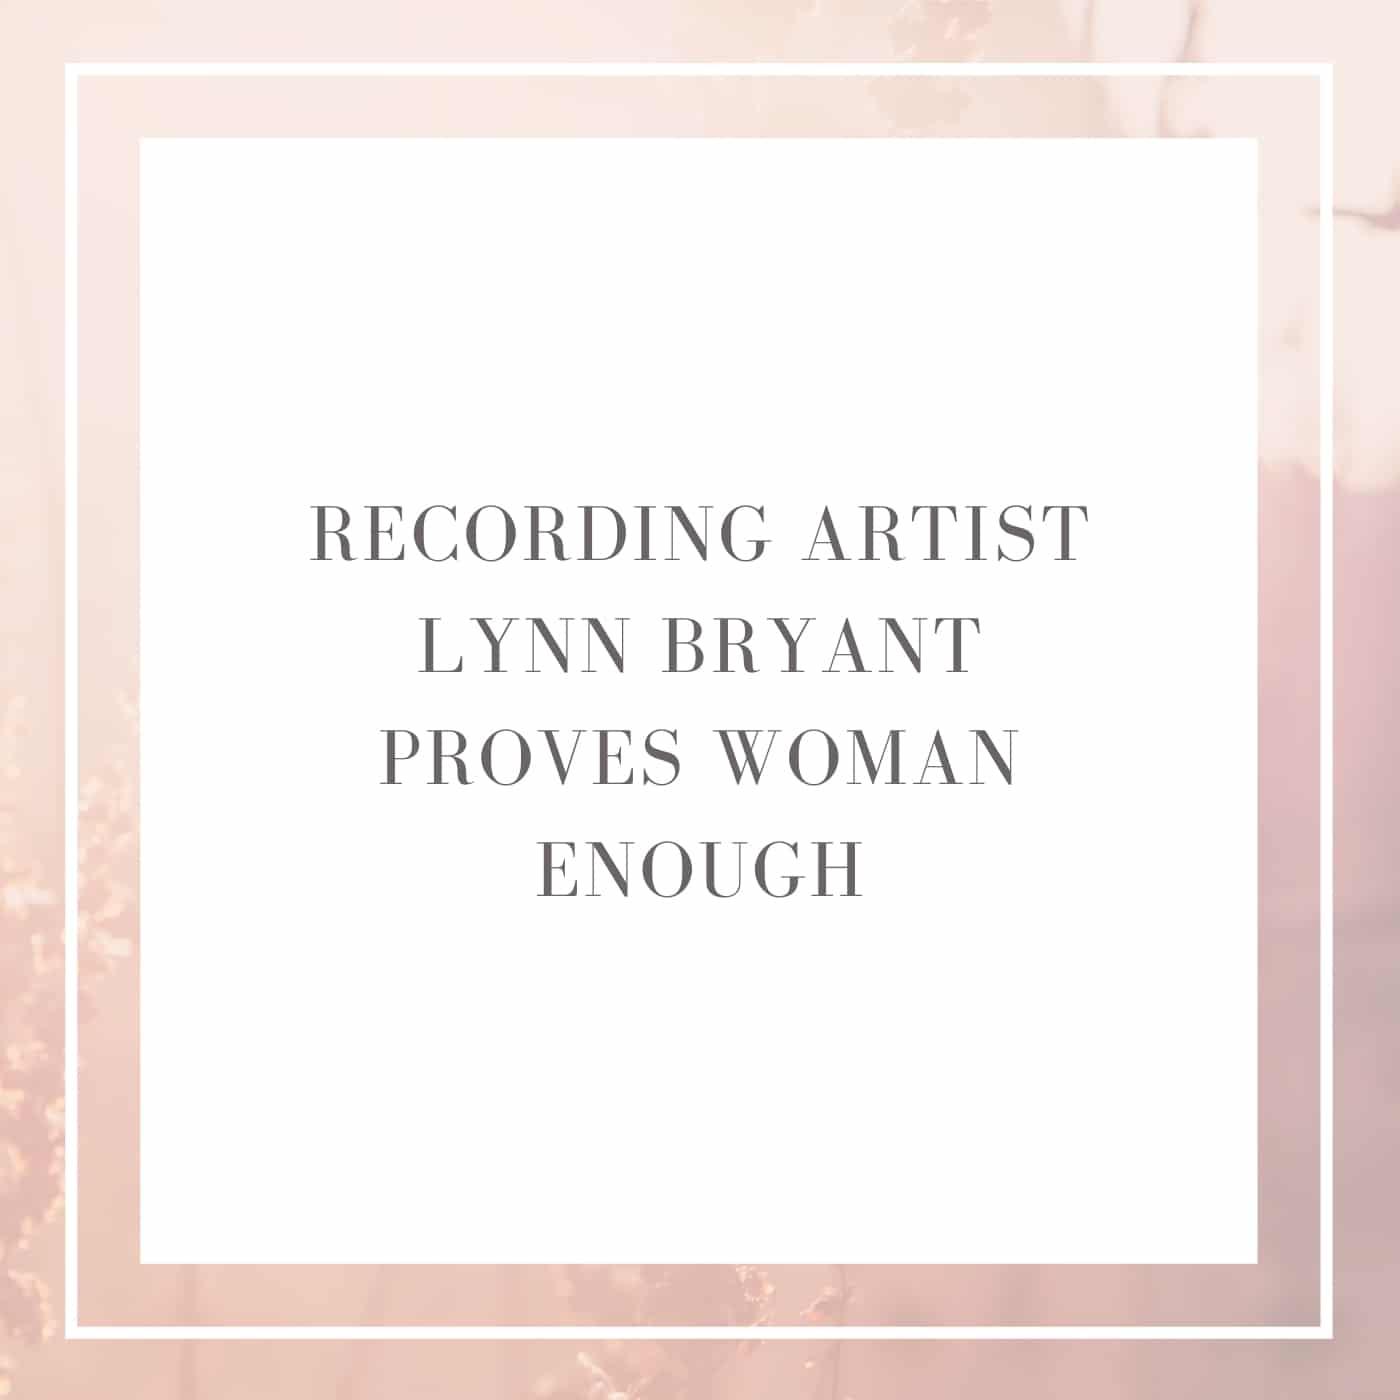 Recording Artist Lynn Bryant